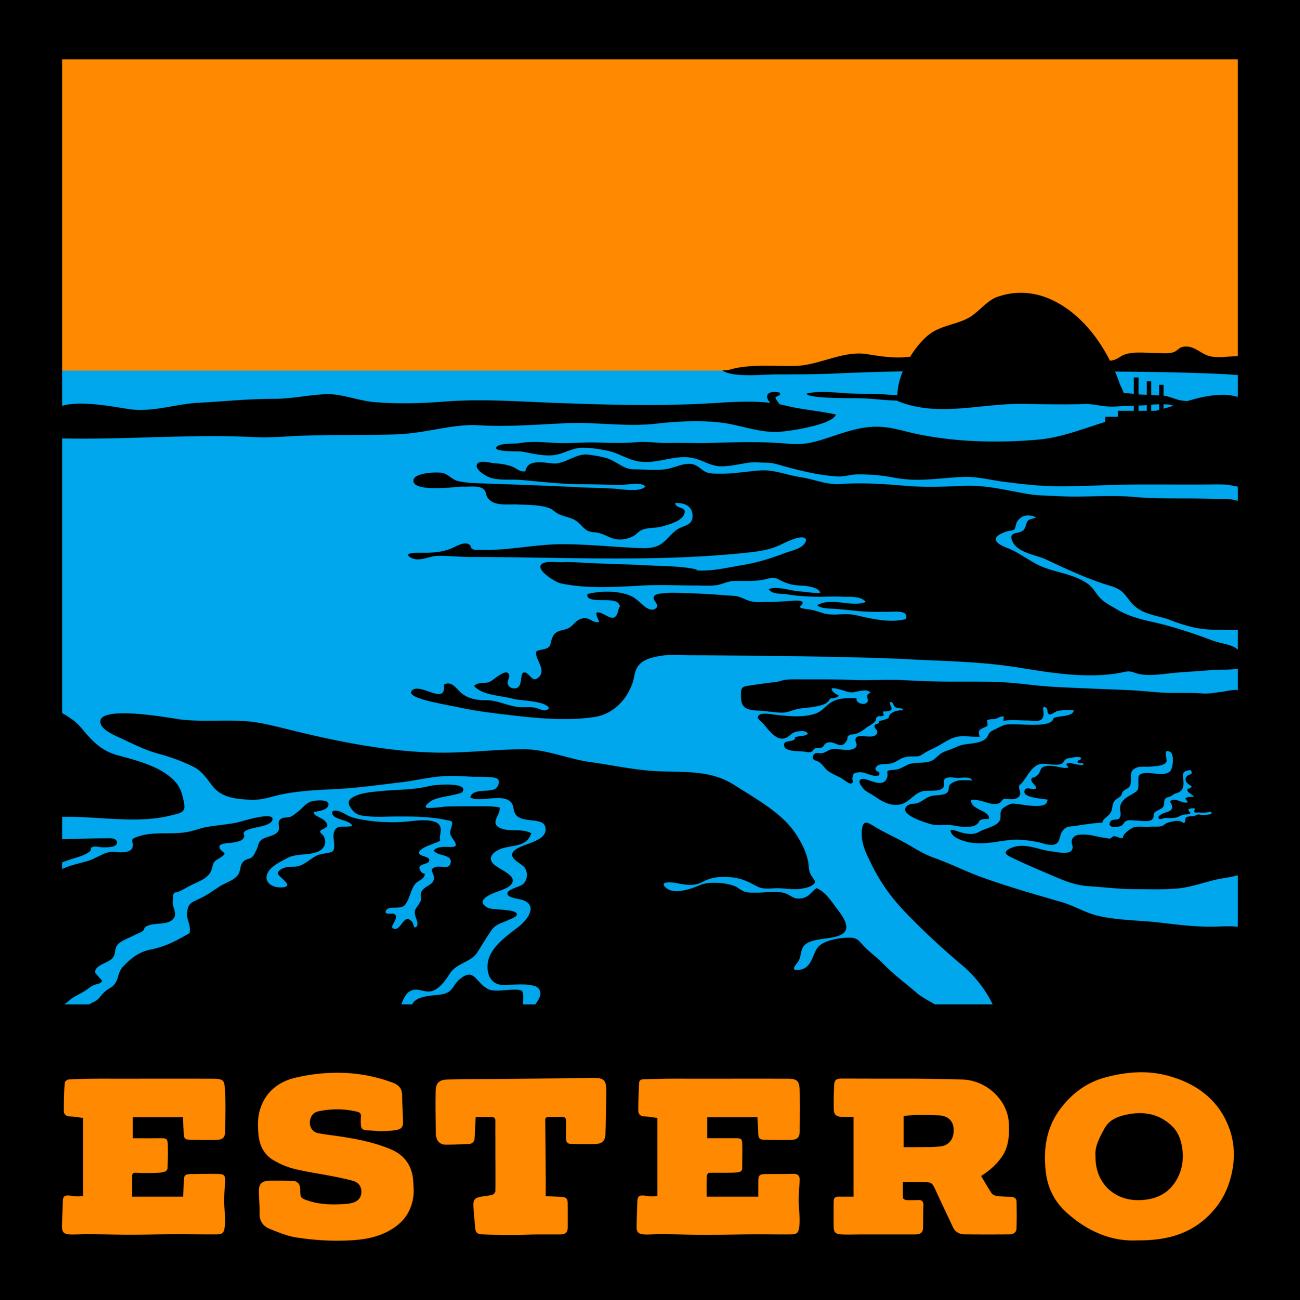 ESTERO Estuary Logo Rounded 3 Color FINAL - SQUARE.png